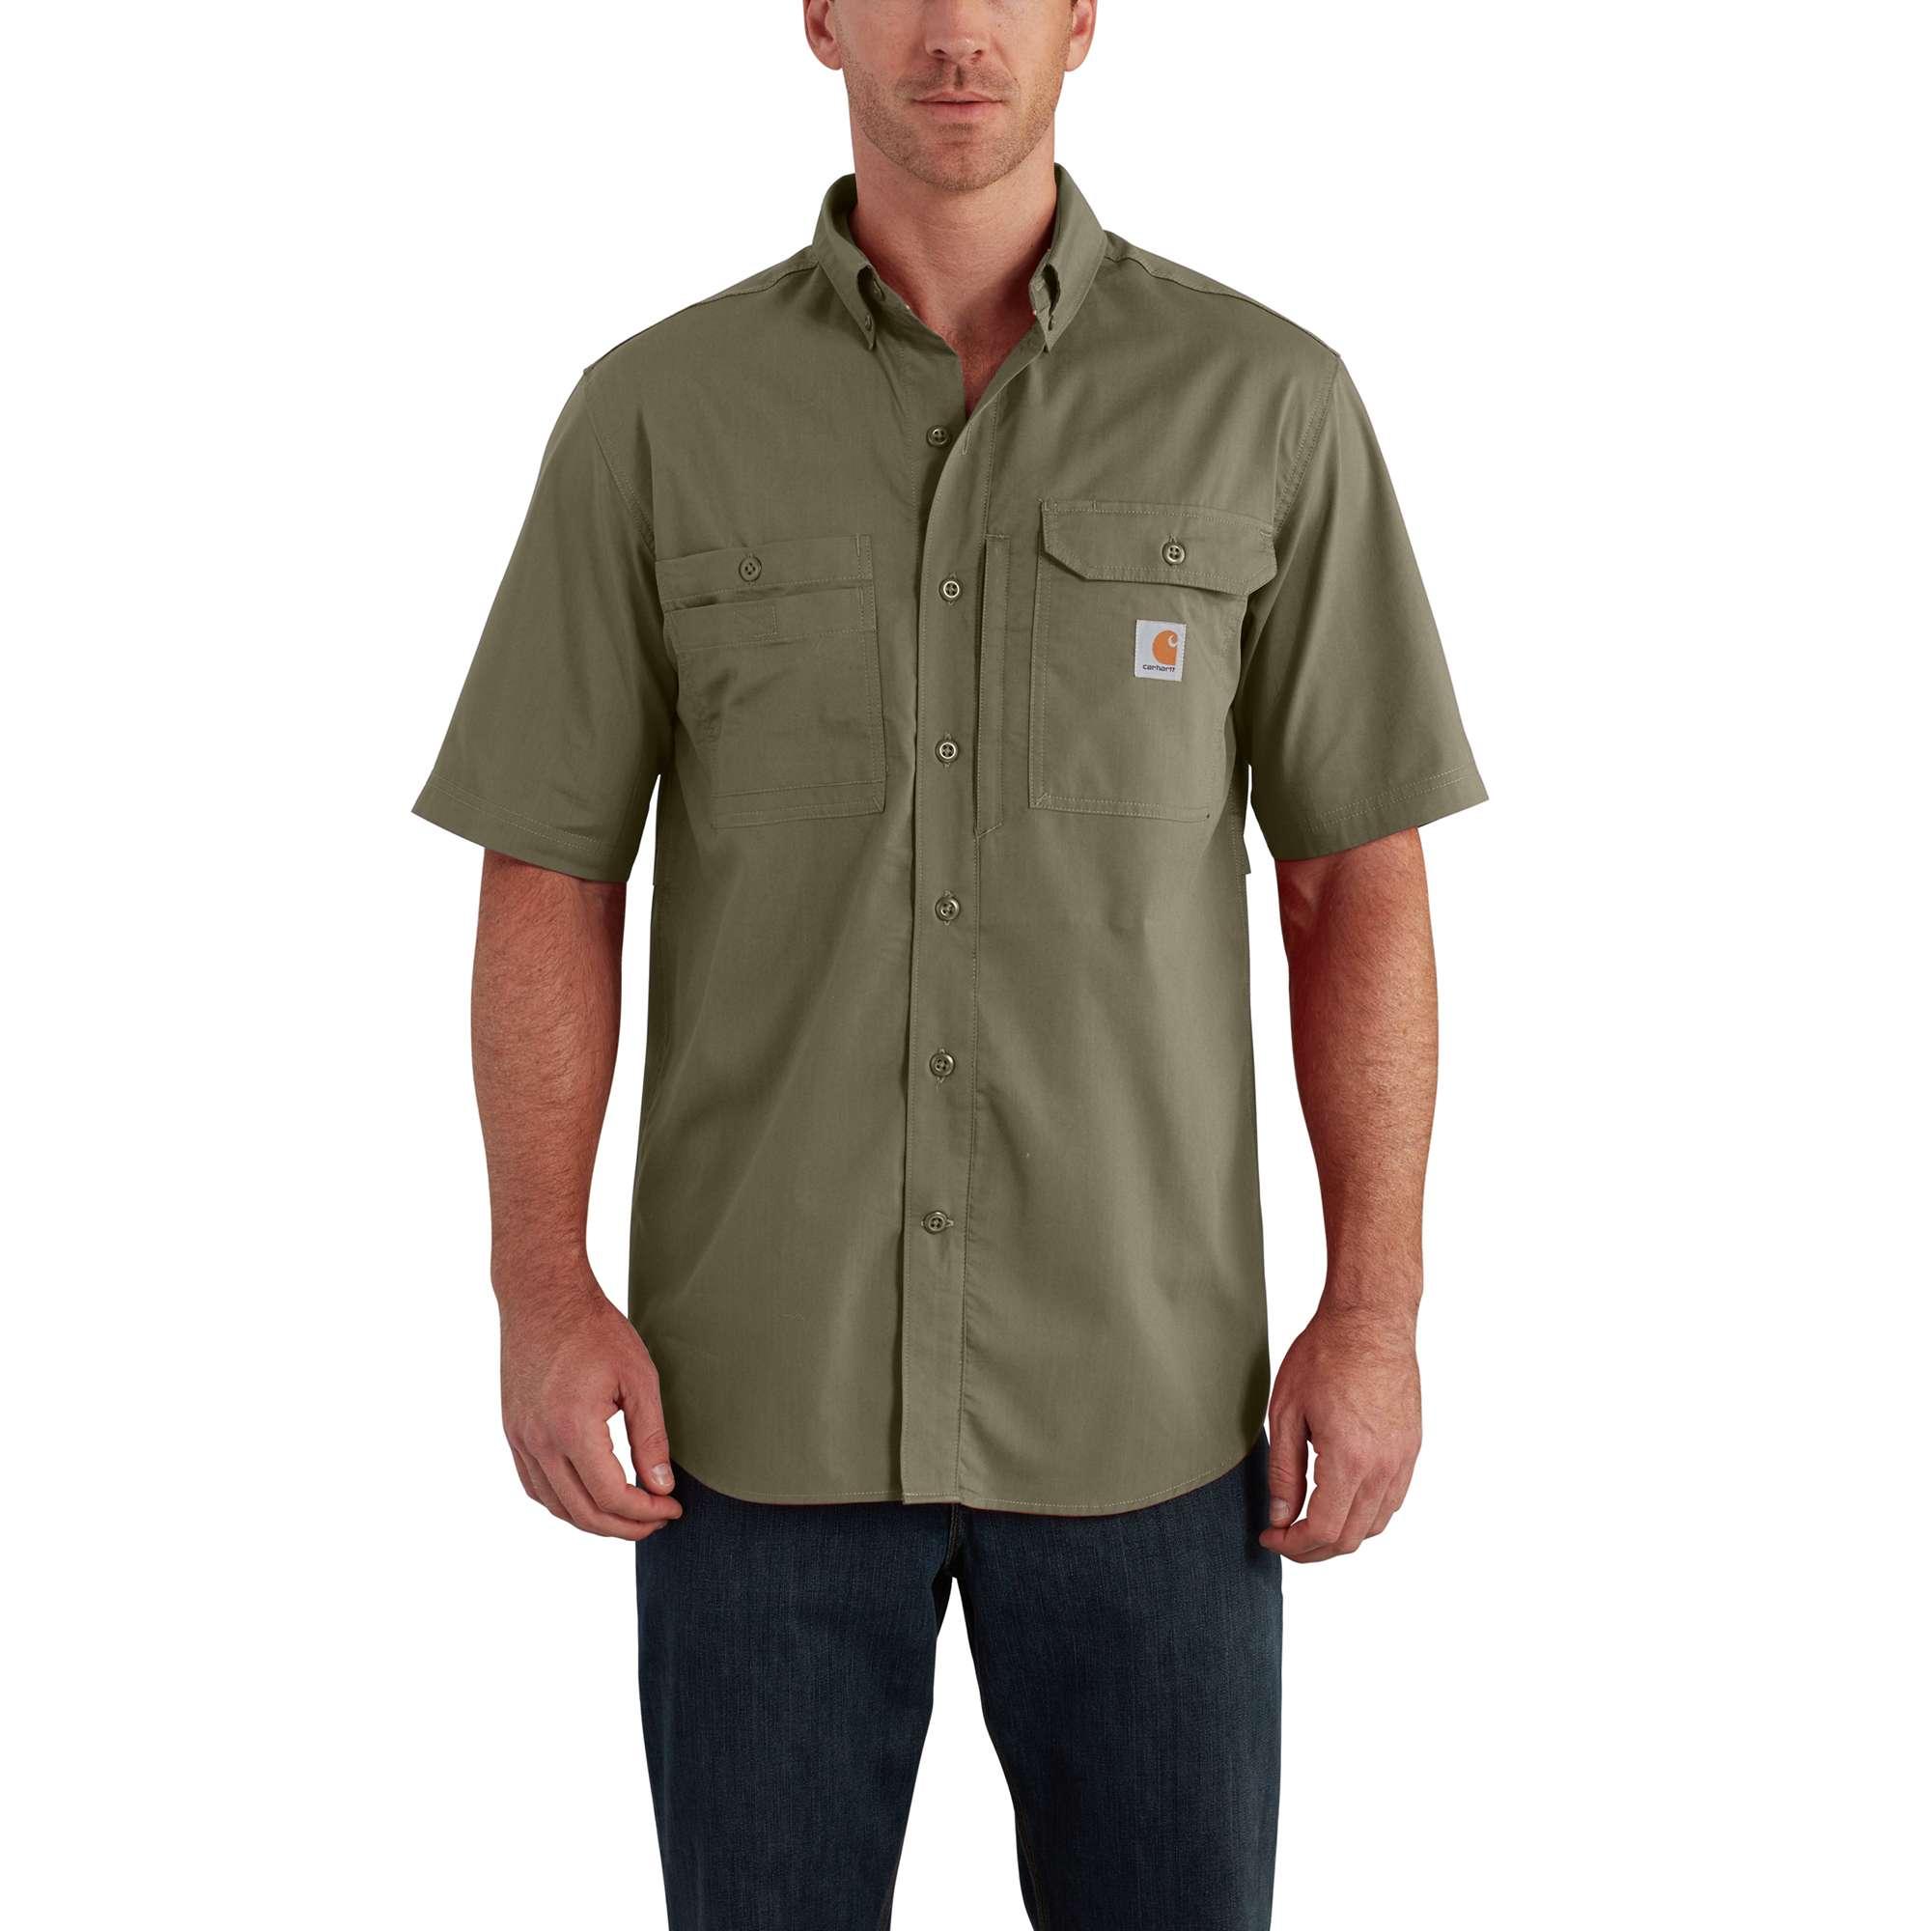 Carhartt Carhartt Force Ridgefield Solid Short Sleeve Shirt